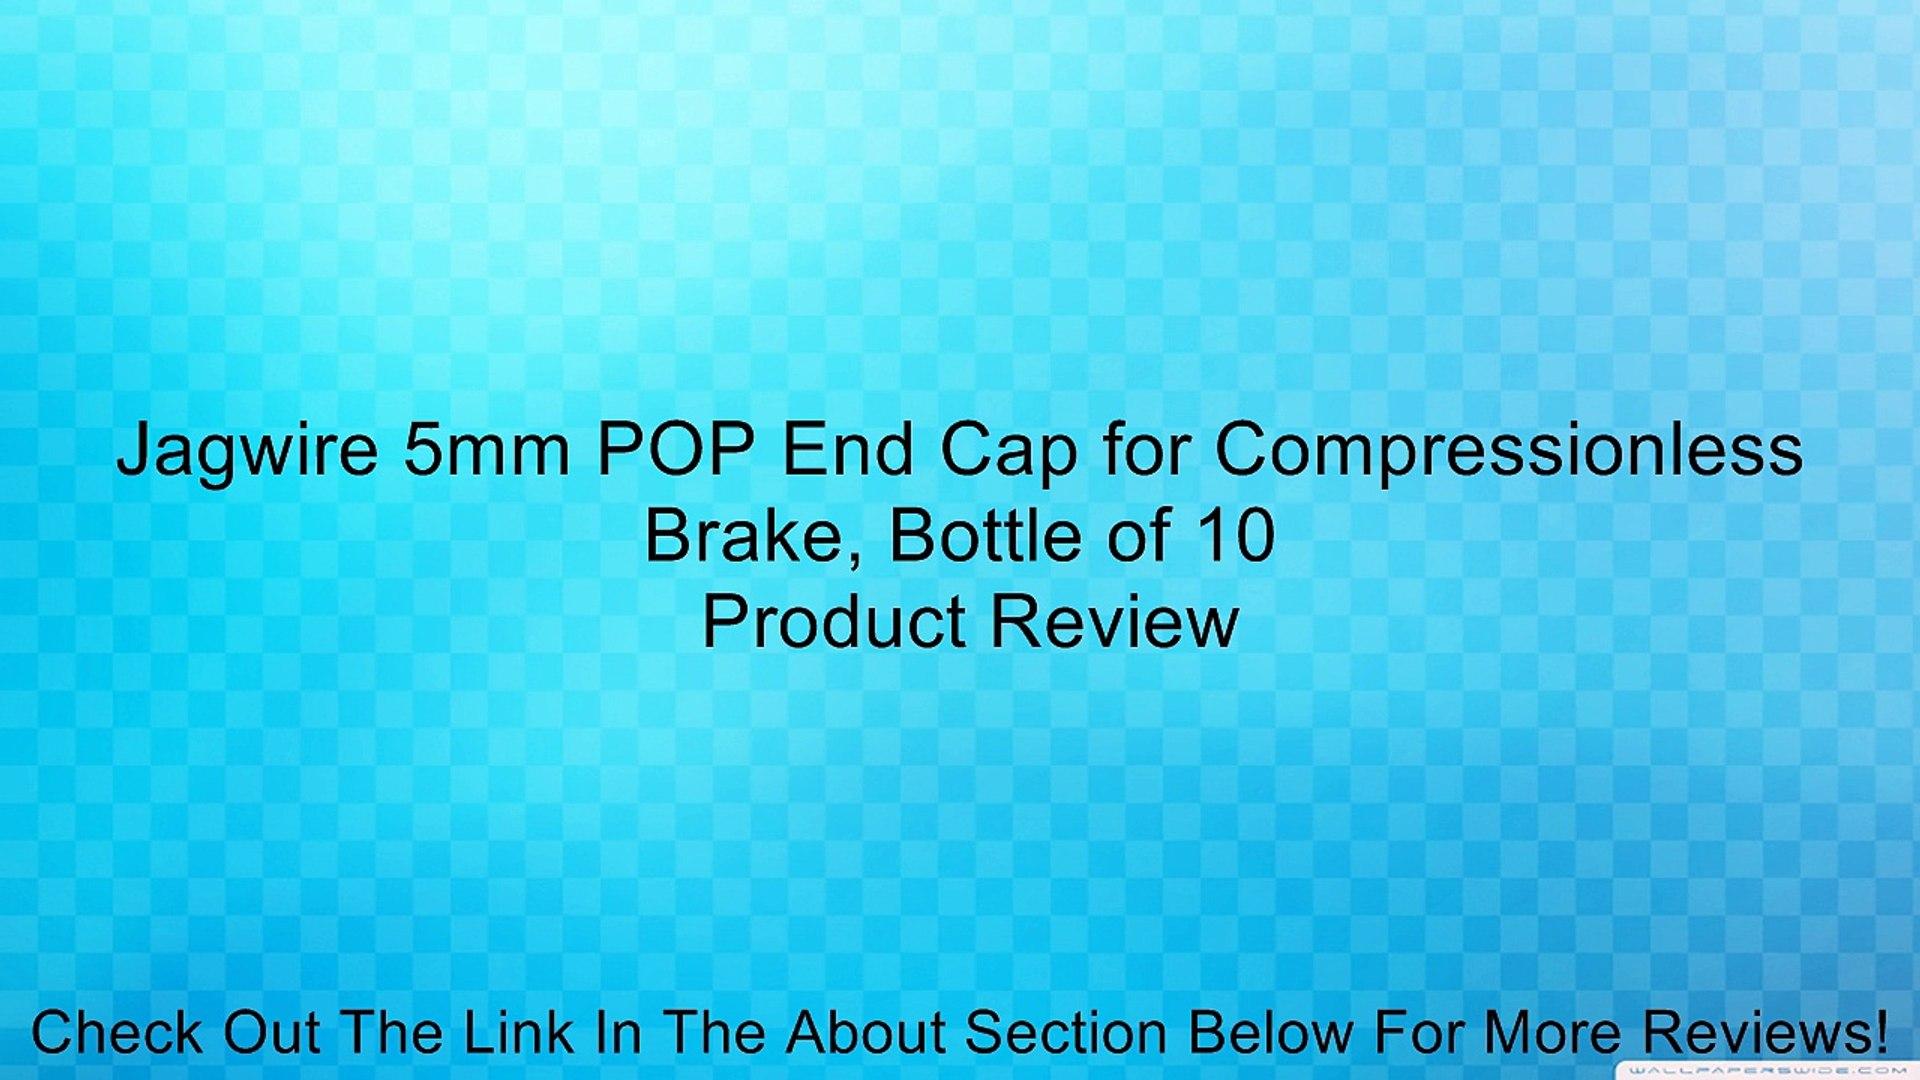 Black Jagwire 5mm POP End Cap for Compressionless Brake Housing Bottle of 10